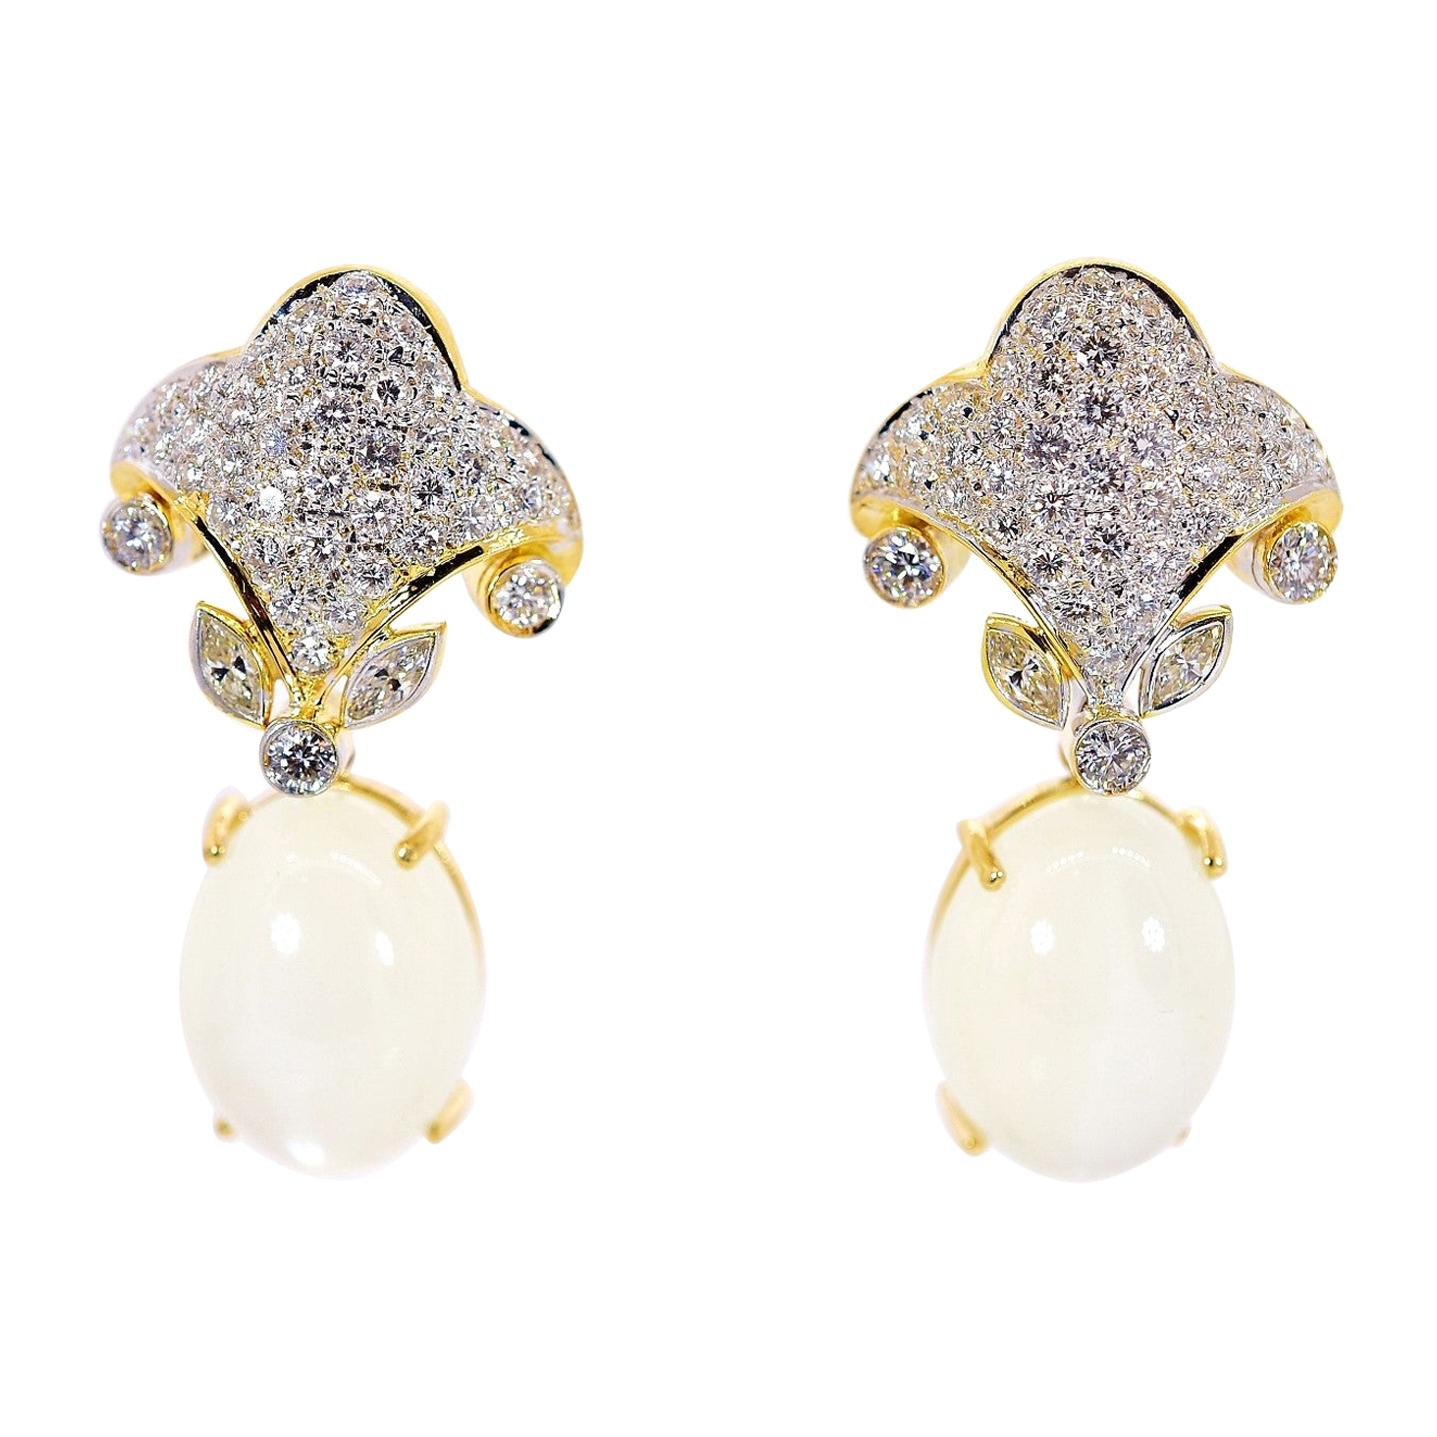 Diamond and Quartz Gold Earrings